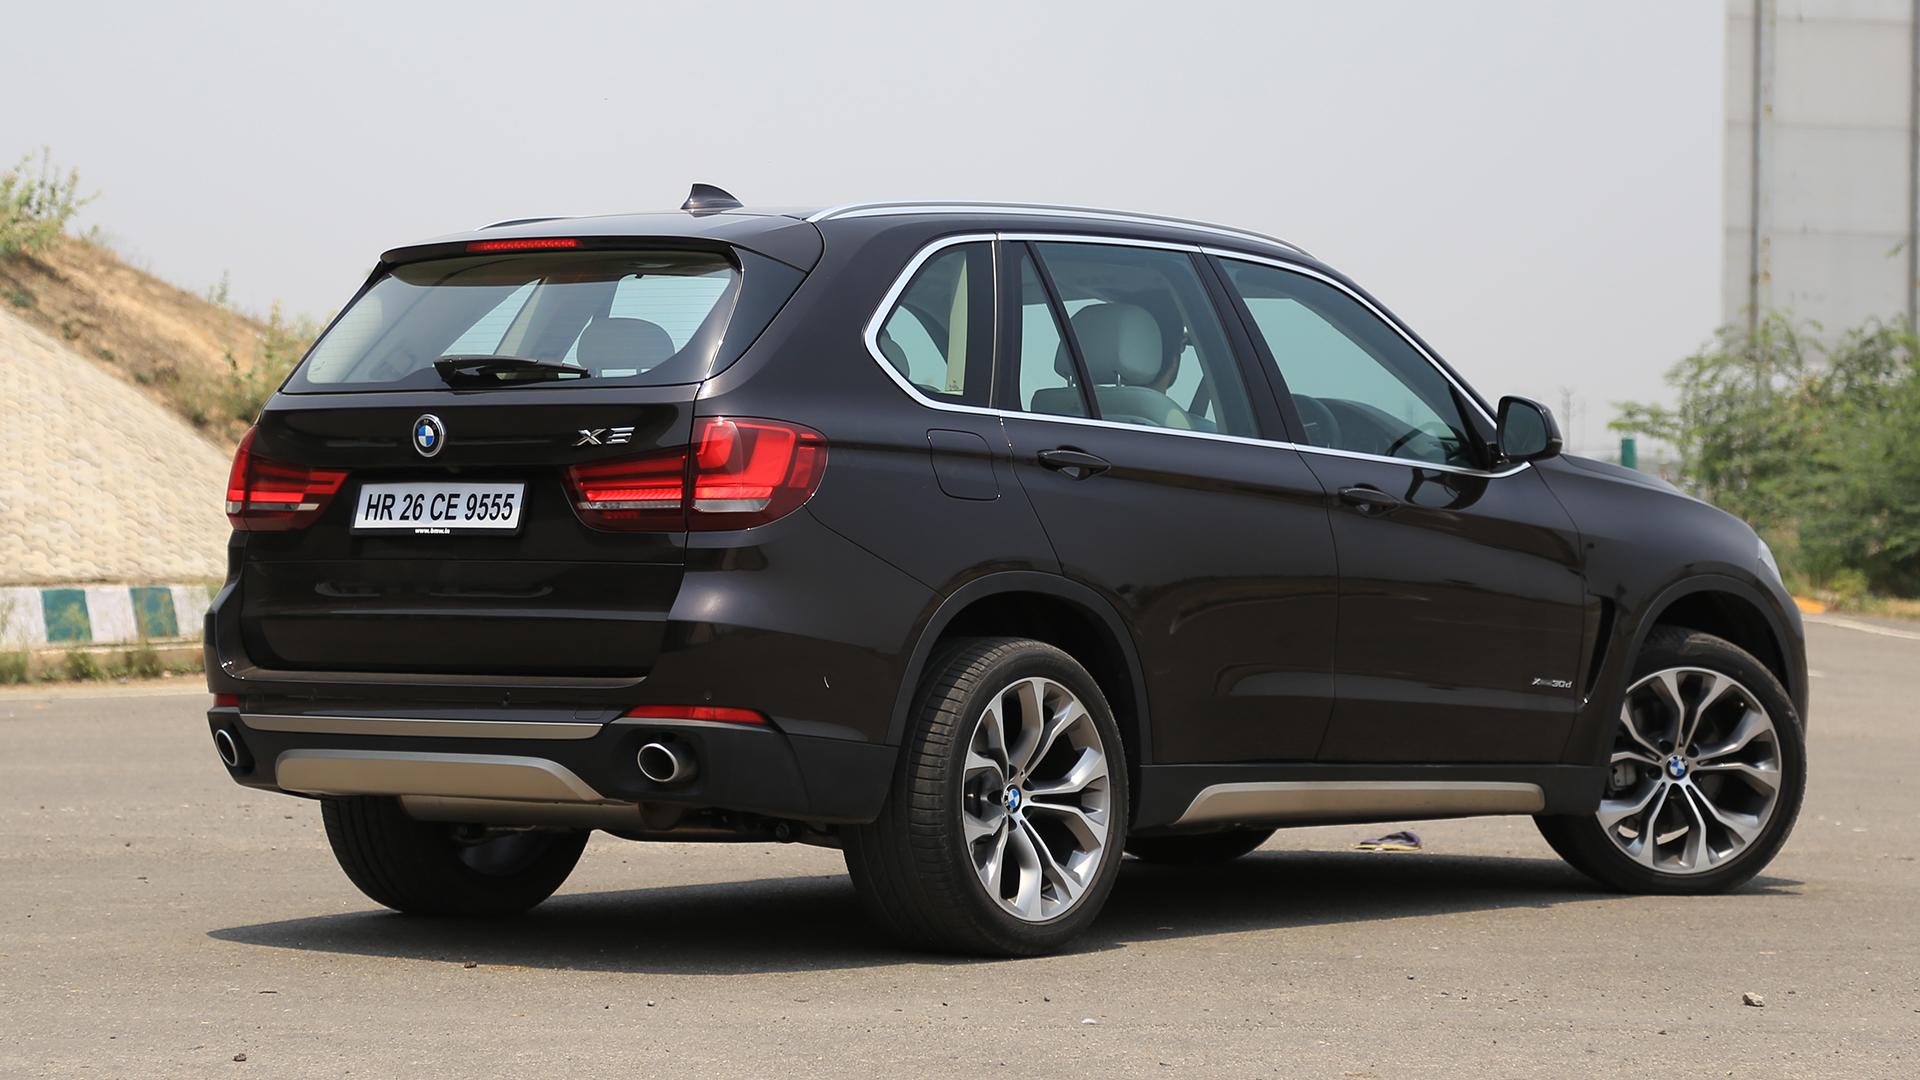 BMW-X5-2014-xDrive30d Exterior